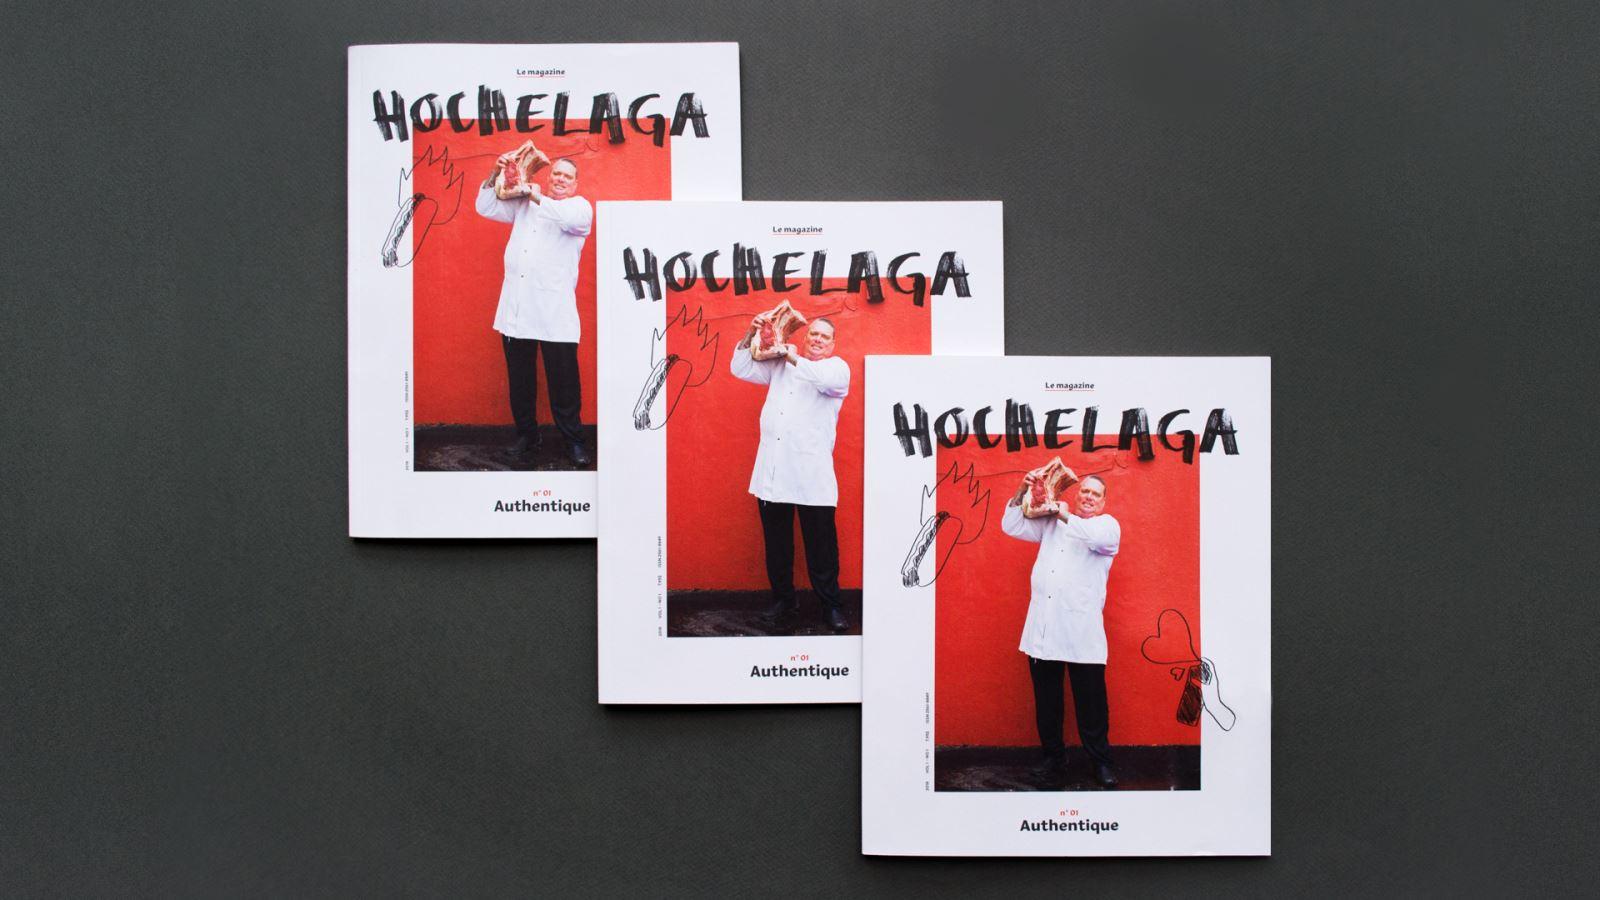 Featuring_MagazineHochelaga_01